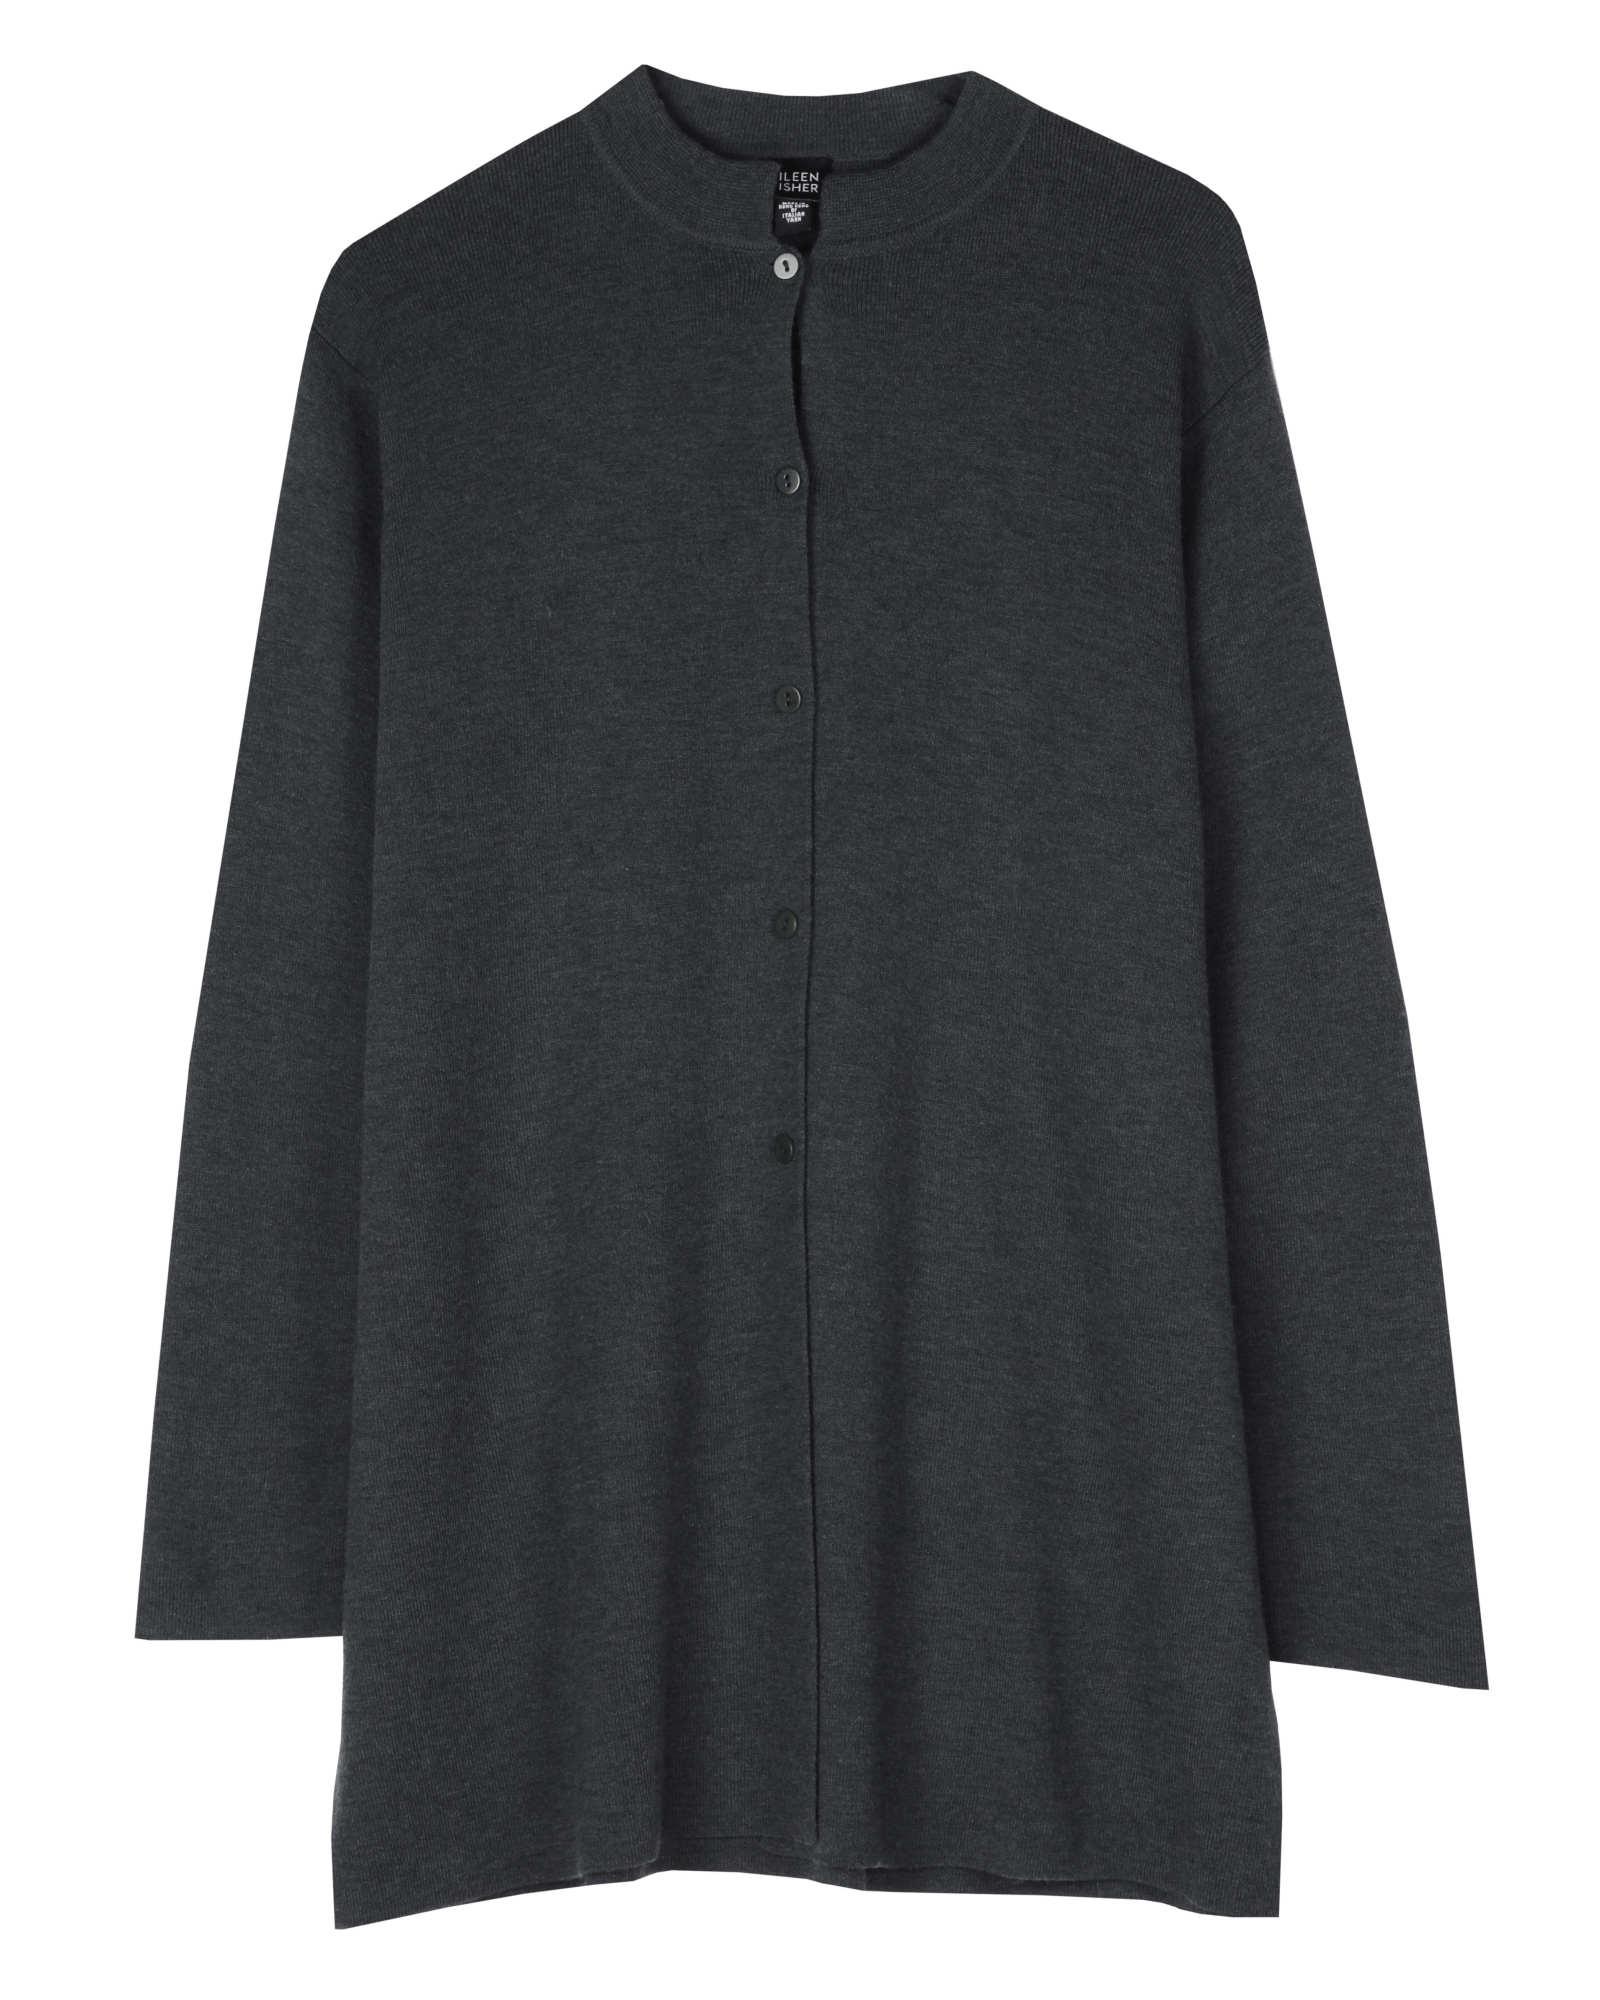 Washable Wool Crepe Jacket